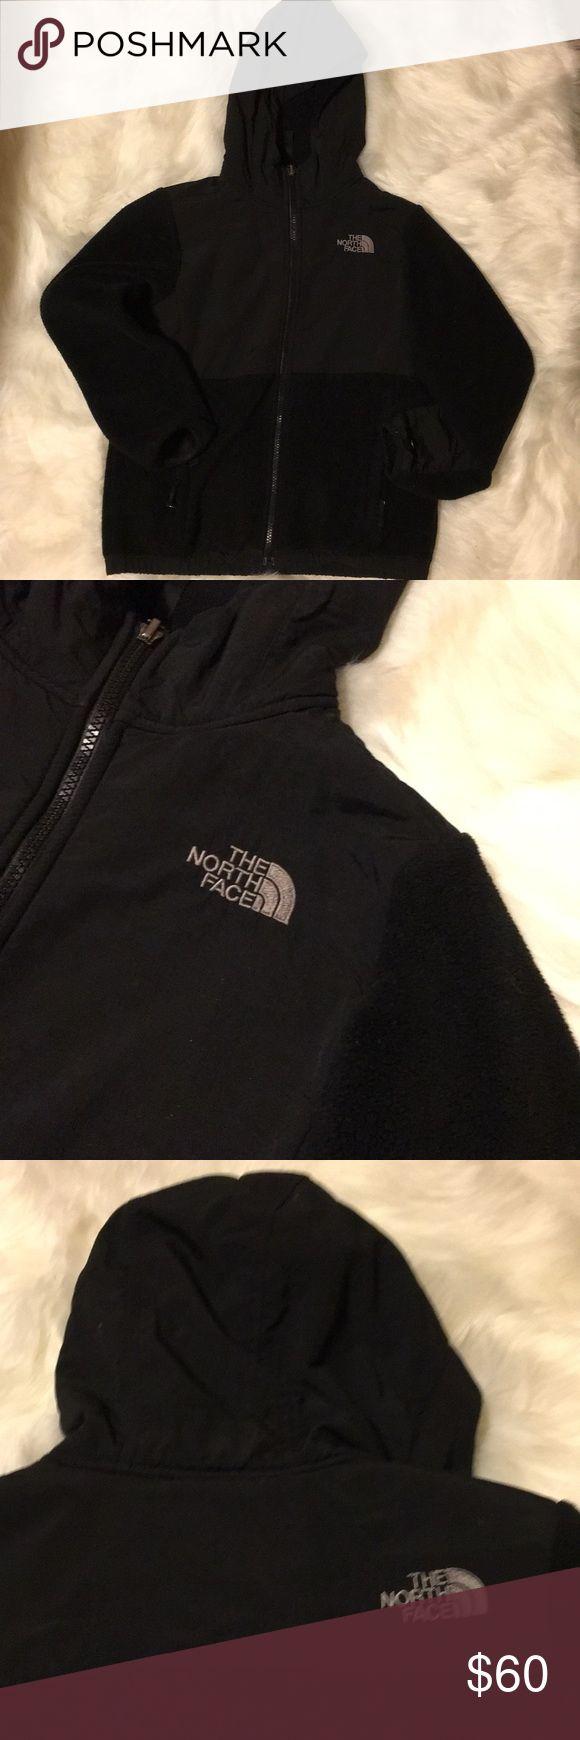 Girls North Face Jacket Girls Black hooded North Face Denali Jacket Medium size 10/12 North Face Jackets & Coats